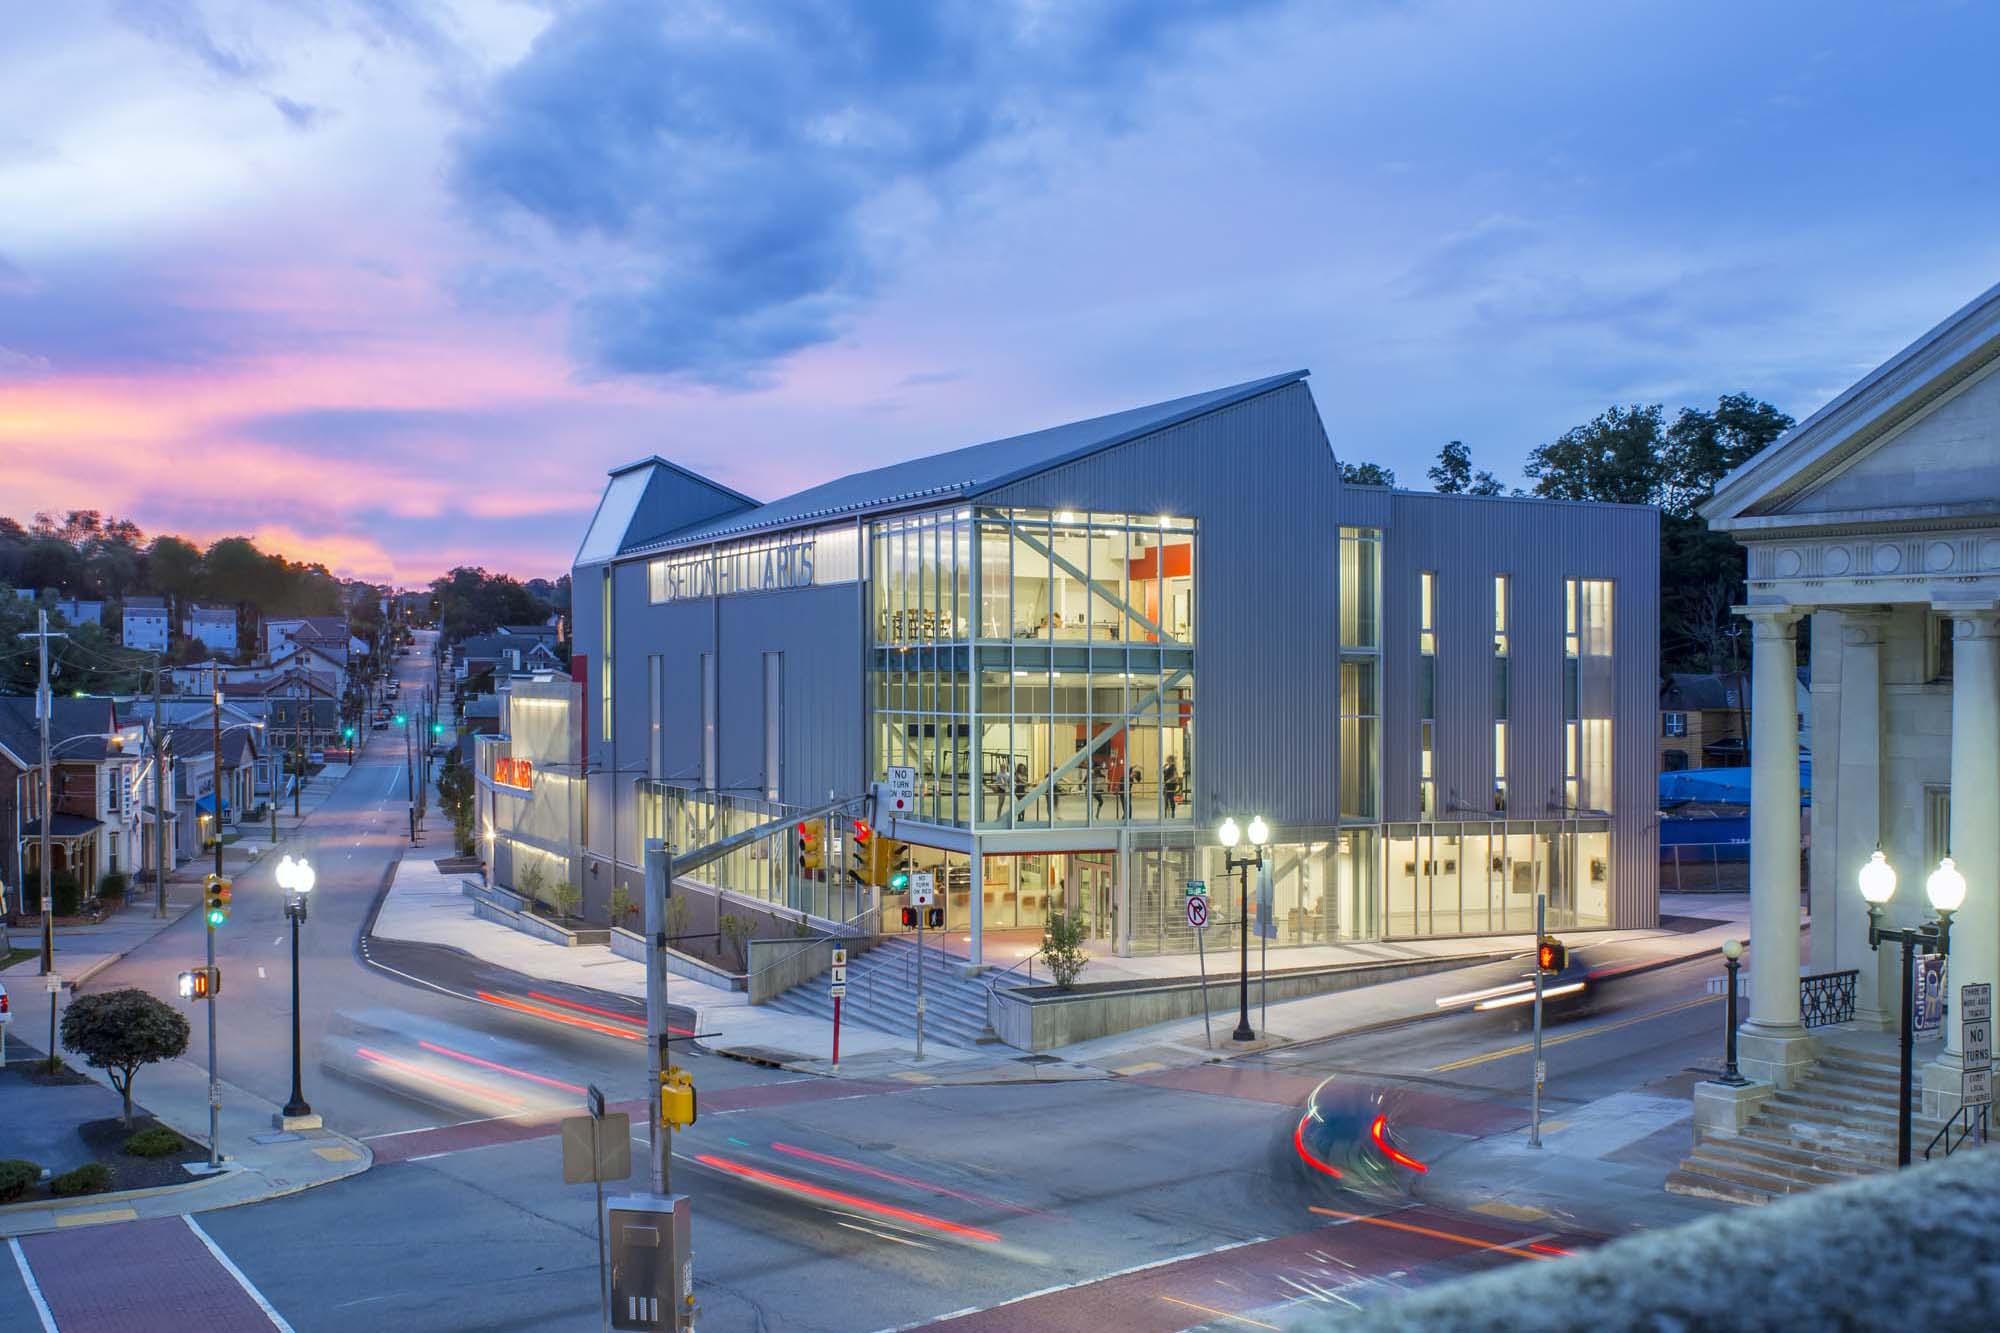 seton hill arts center architect magazine designlab